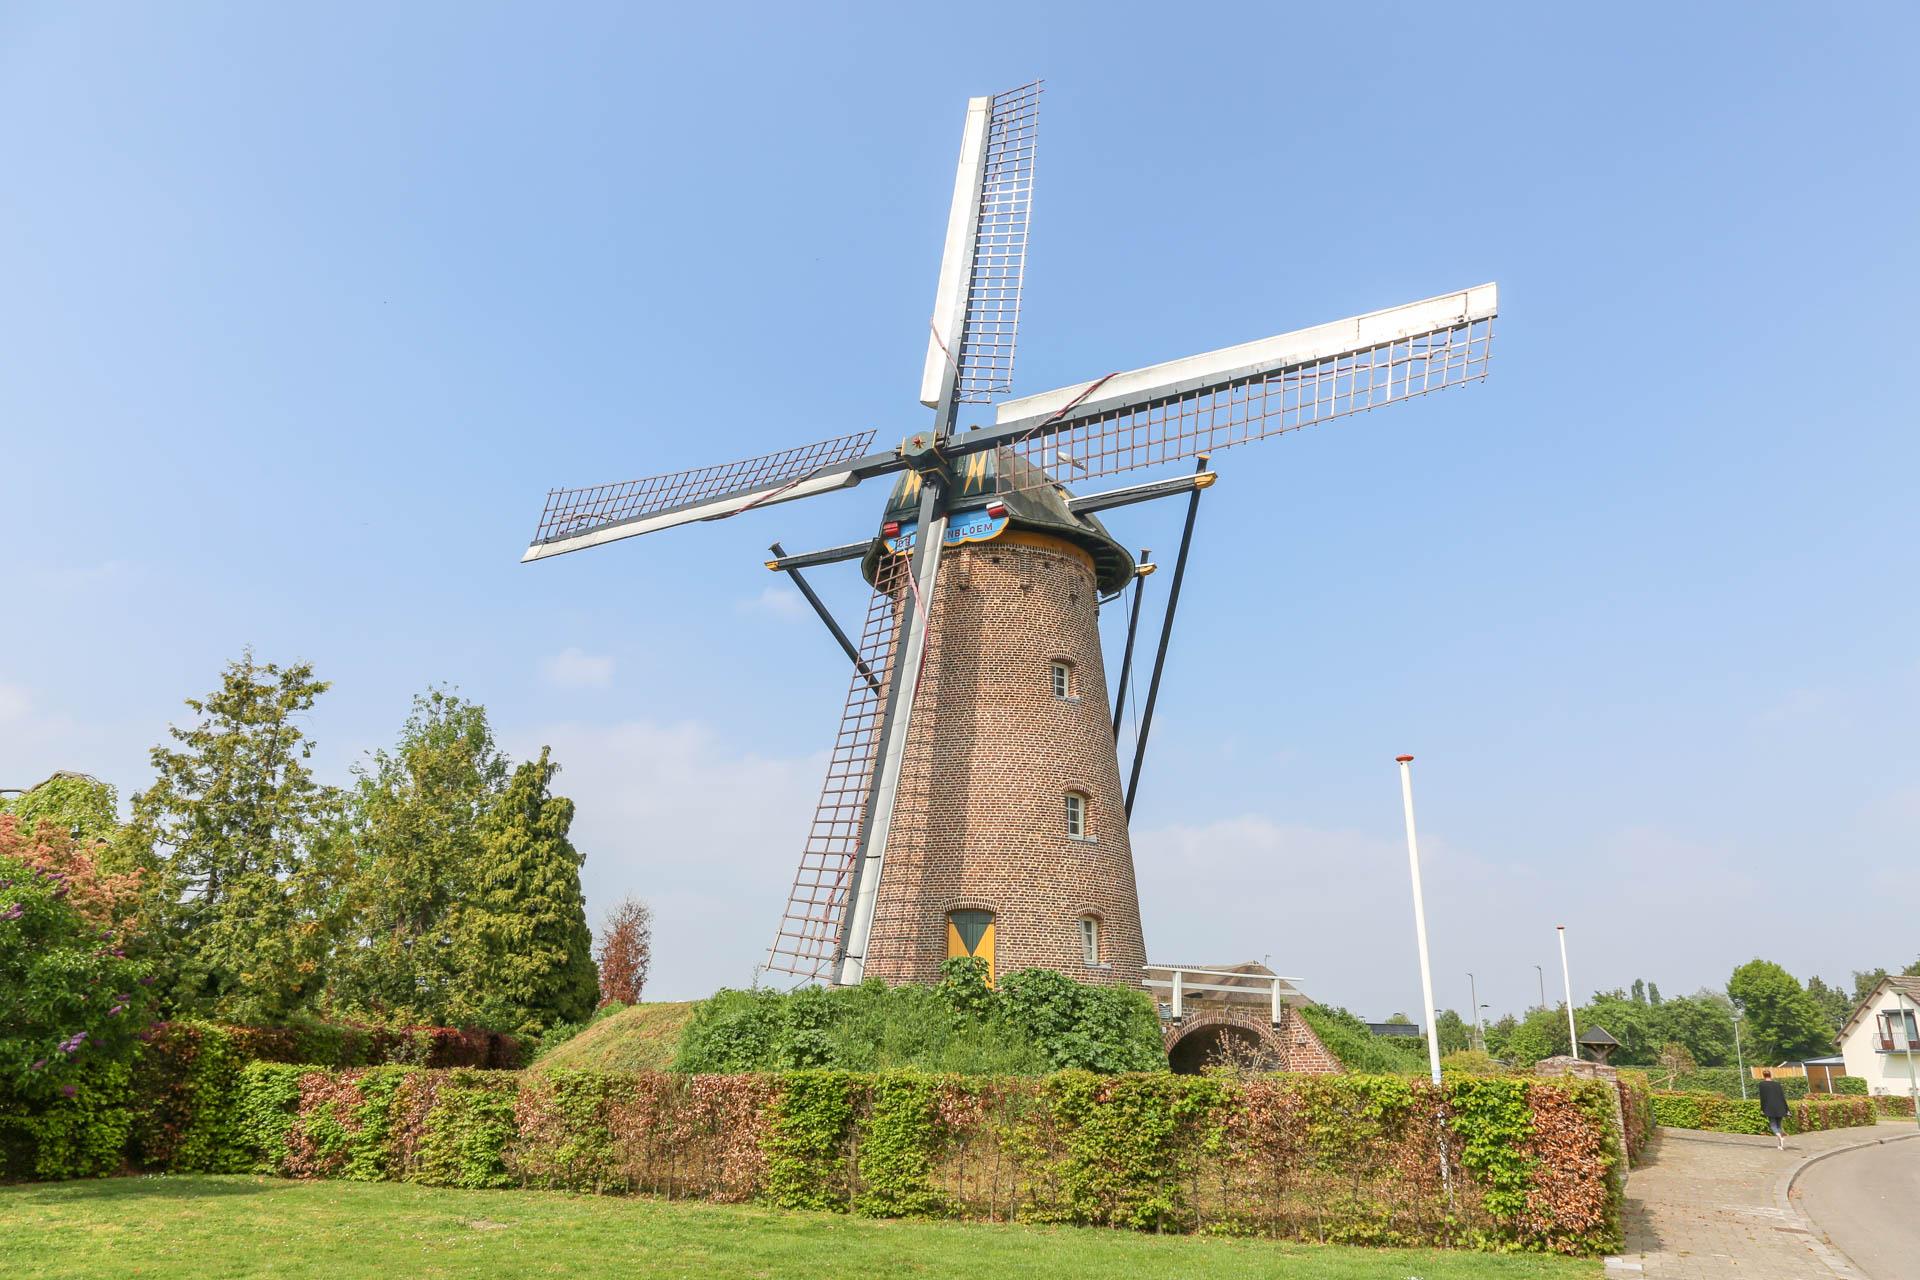 De-Korenbloem-Windmolen-1